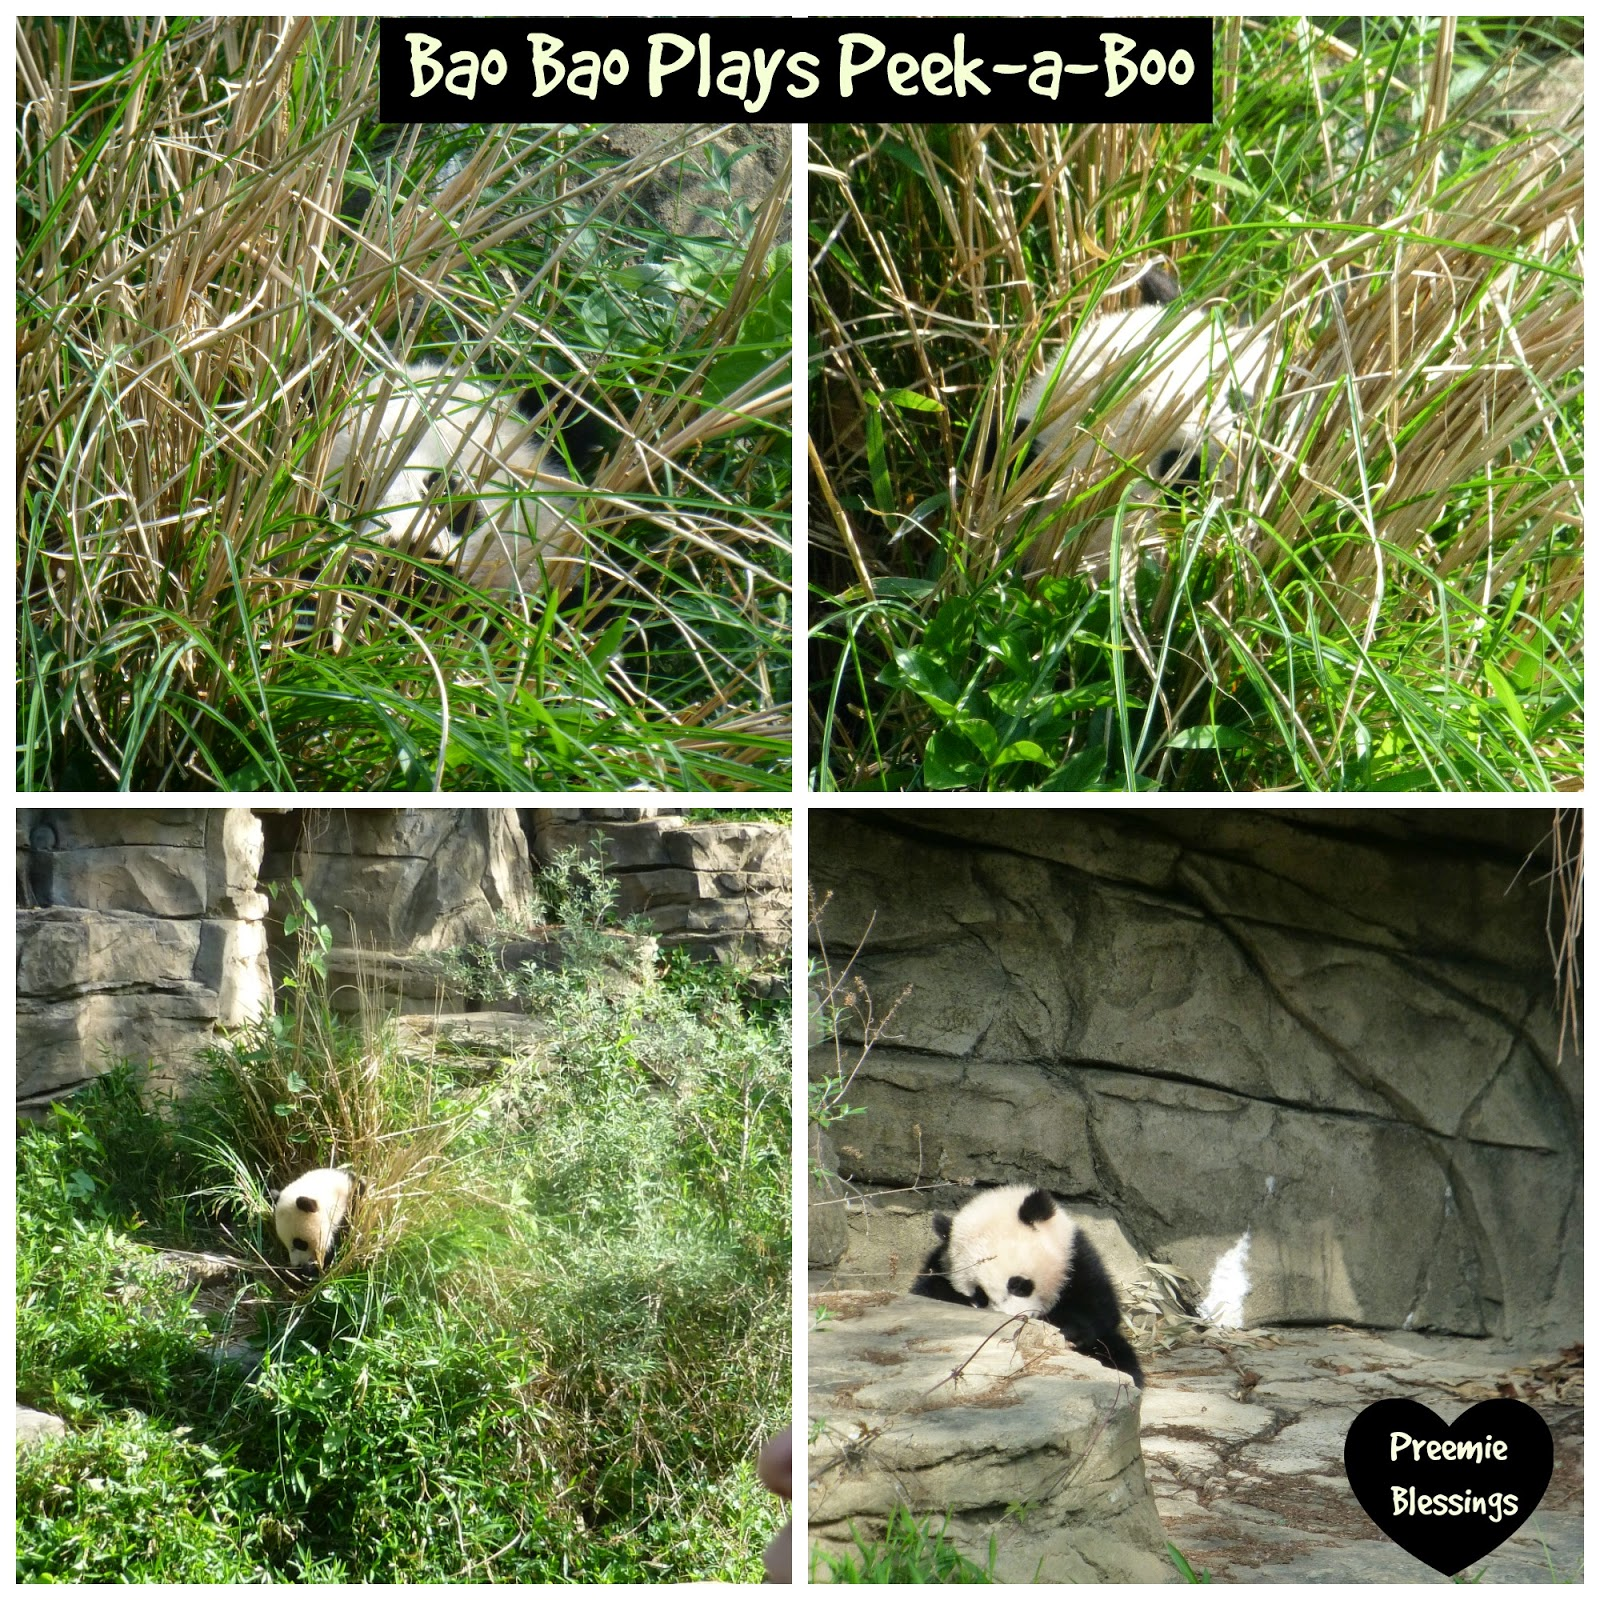 Bao Bao, panda, National Zoo, hide-and-seek